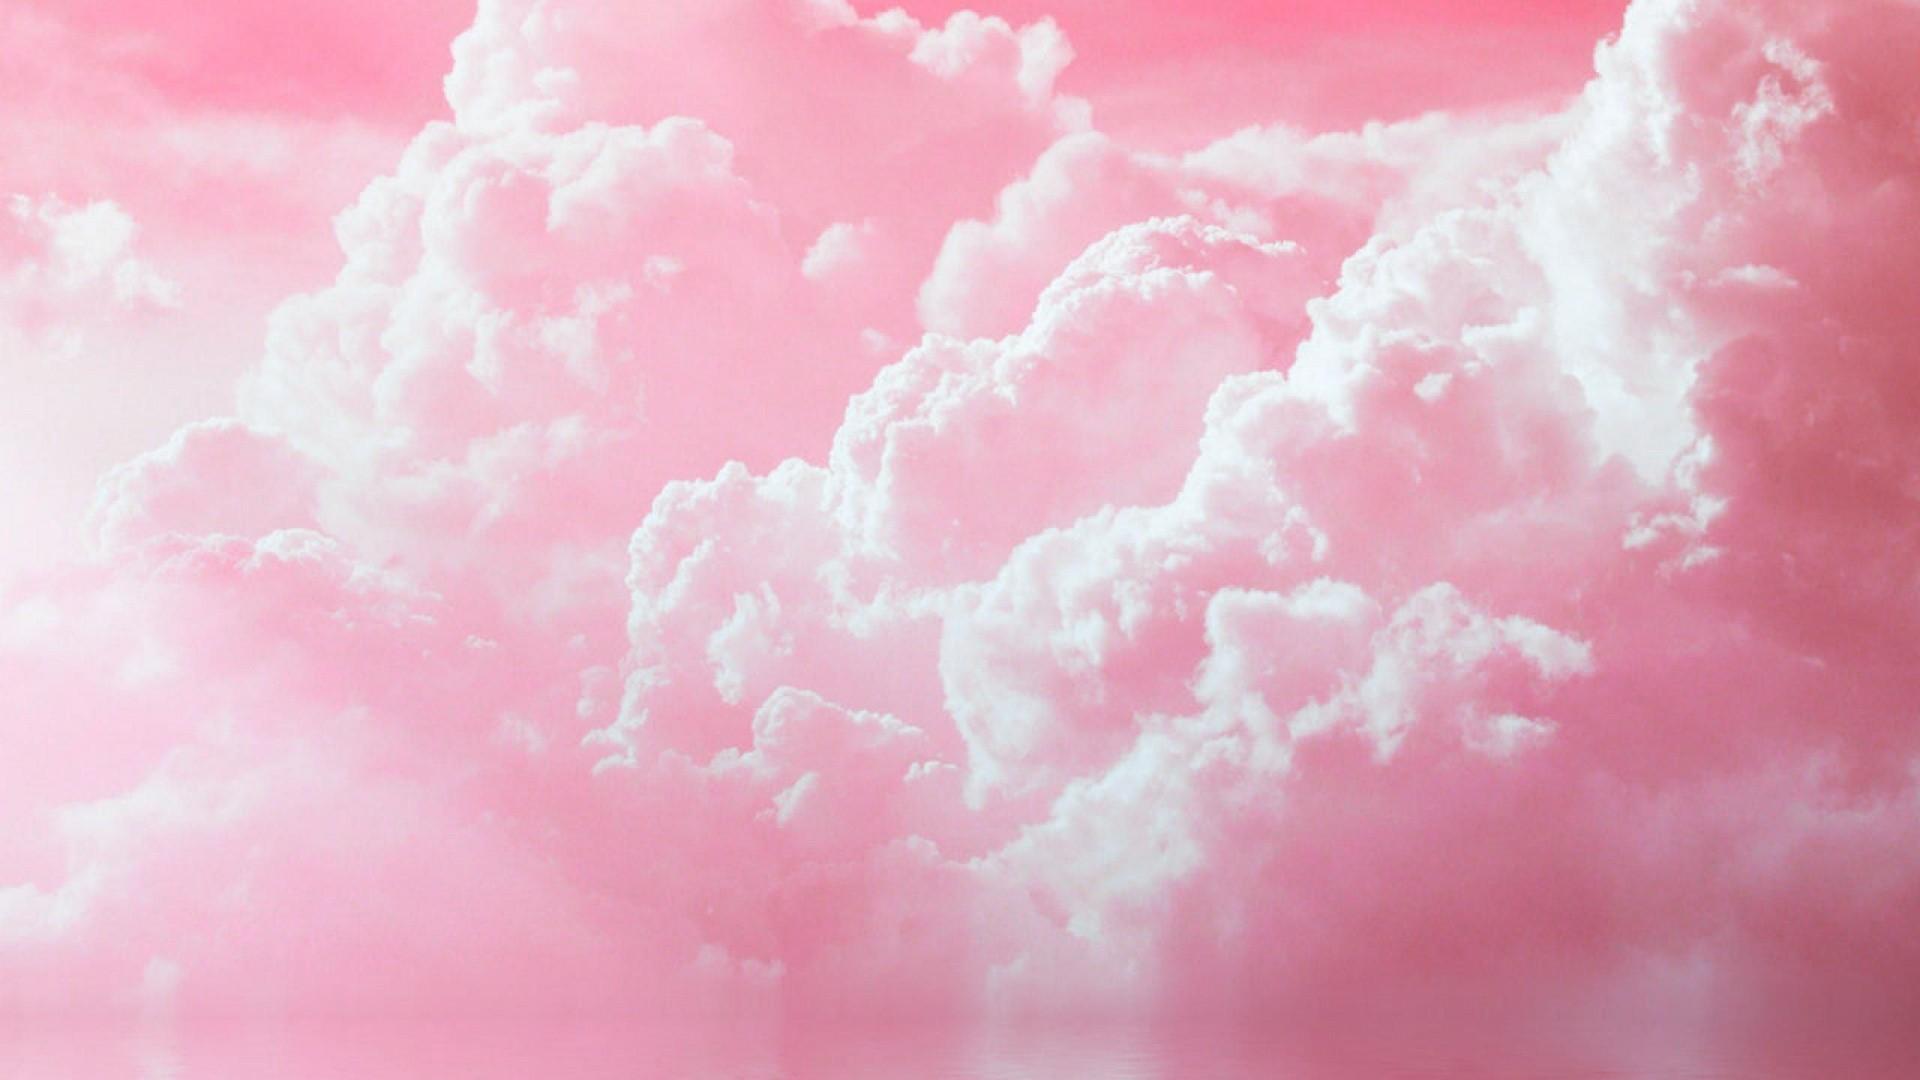 Pink Cloud hd wallpaper download